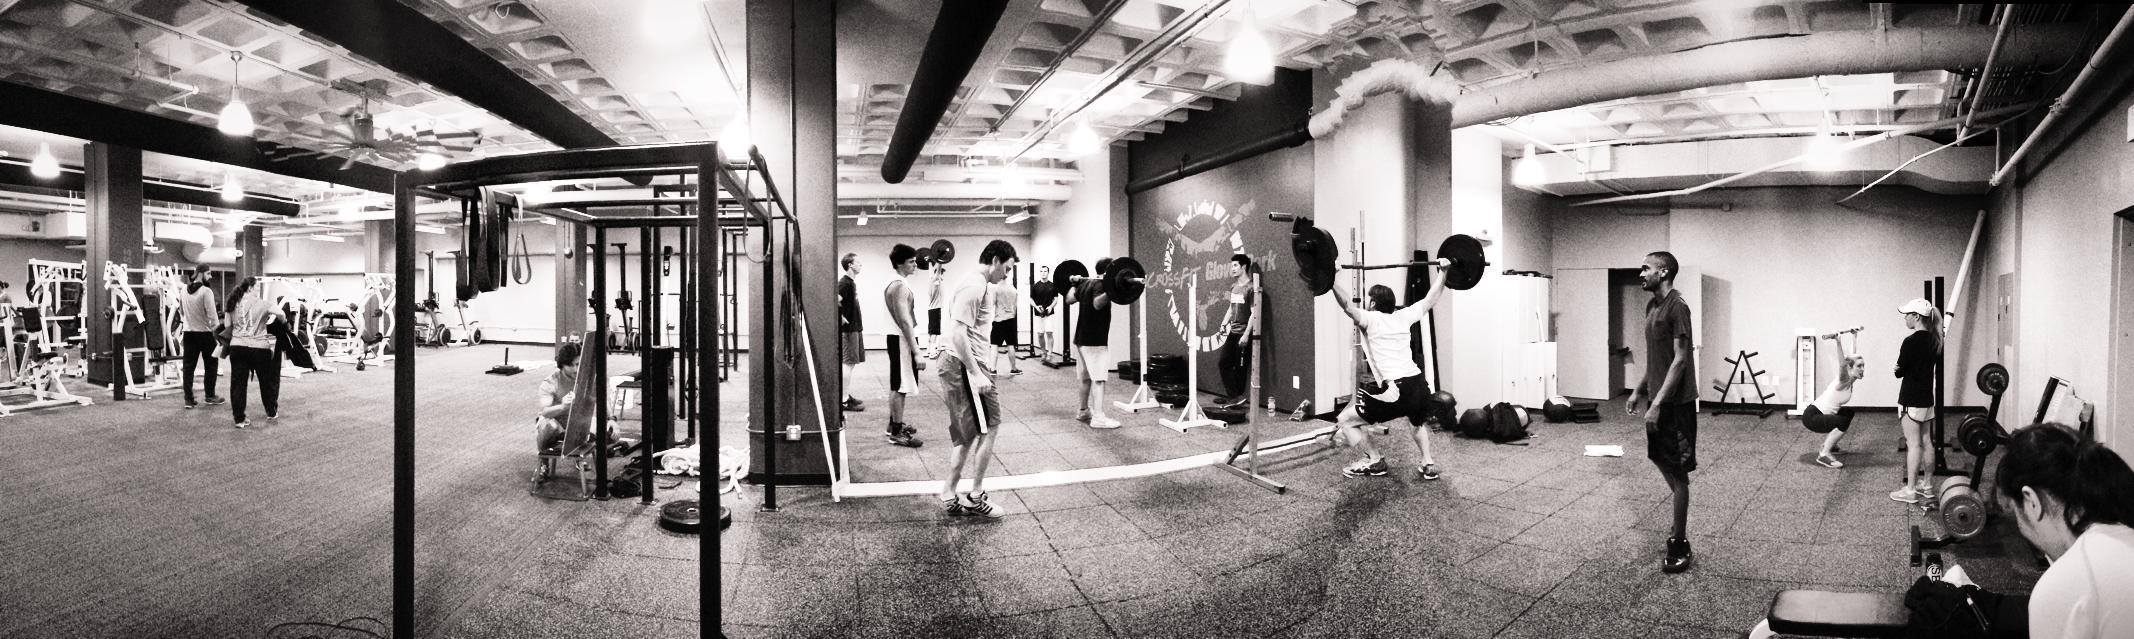 facility-panoramic.jpg